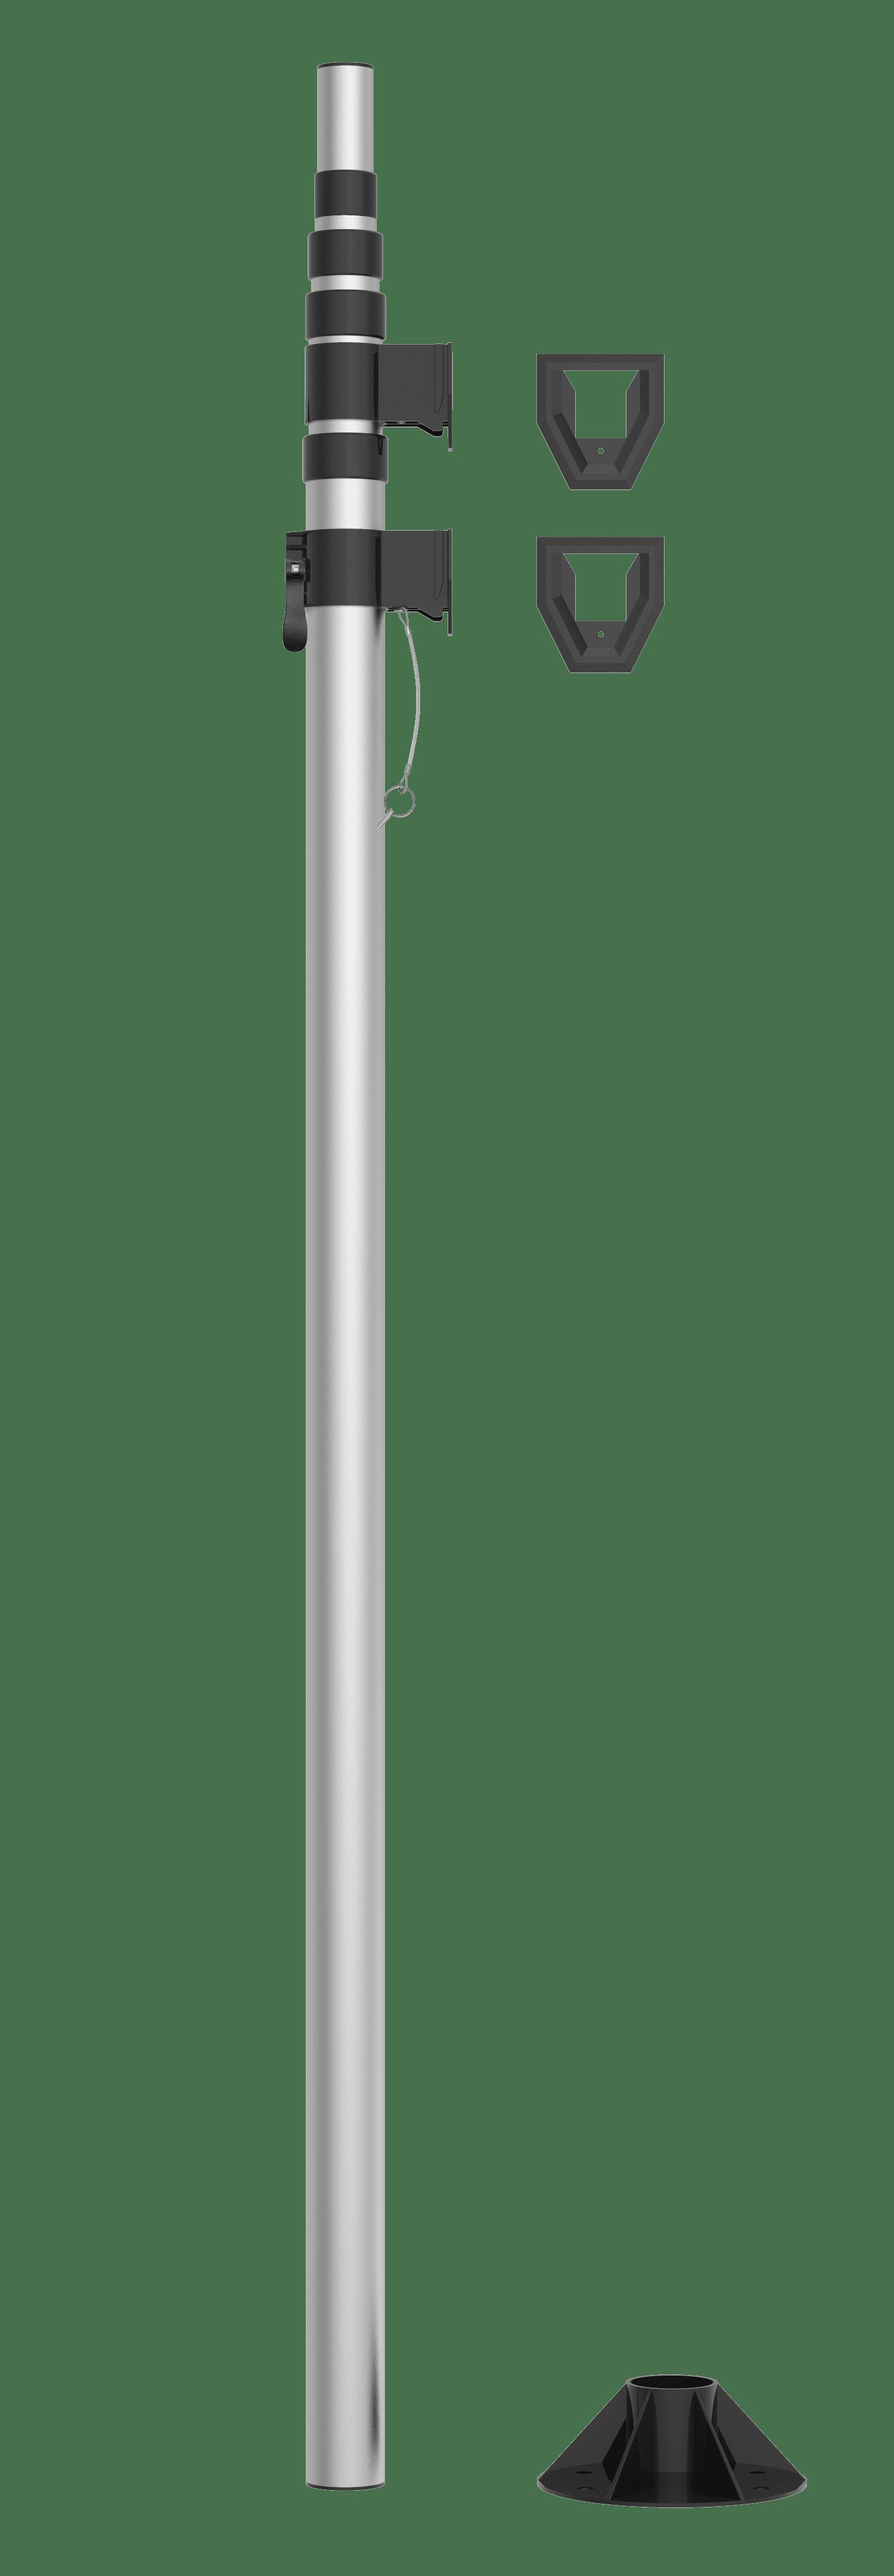 pole-ext-accessory_web